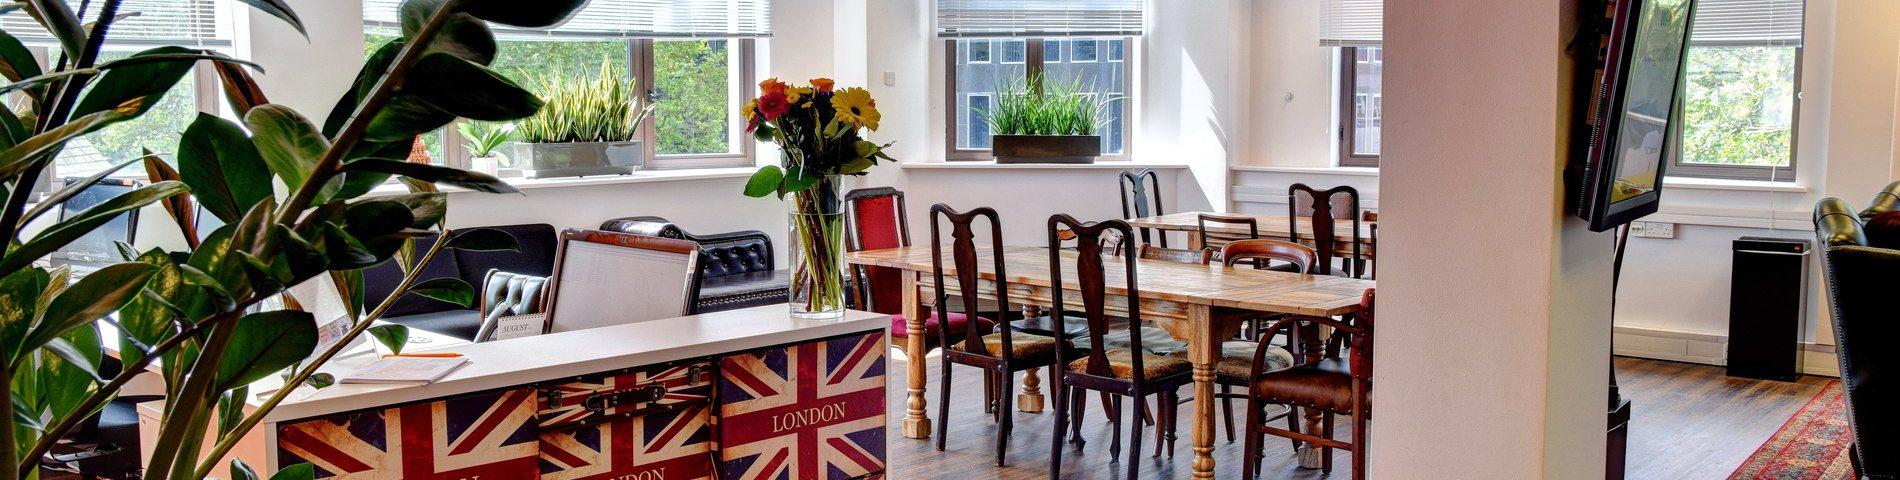 the london school of english executive english